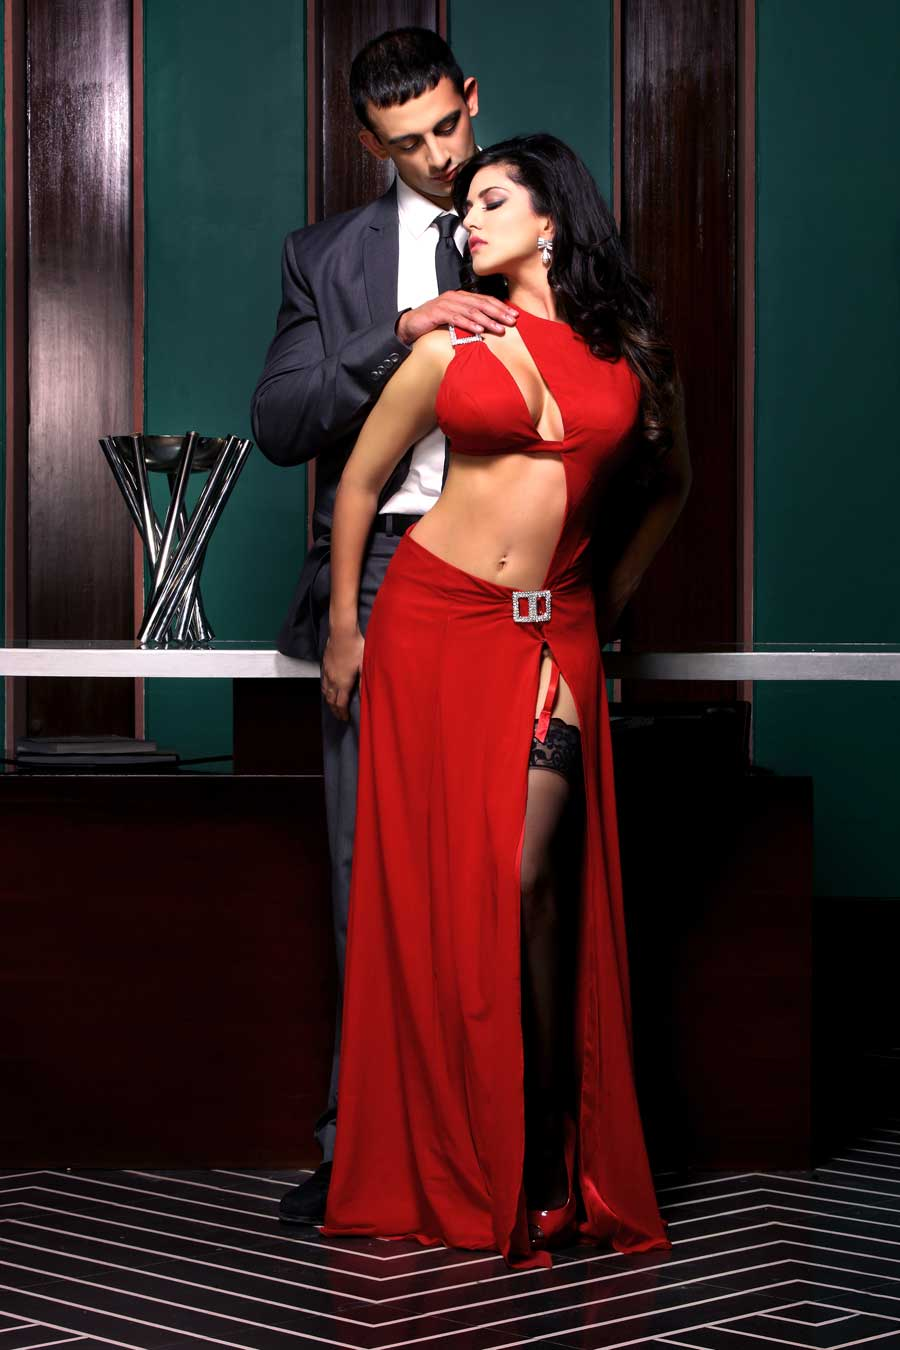 Sunny Leone In Jism 2 Pics • PoPoPics.com